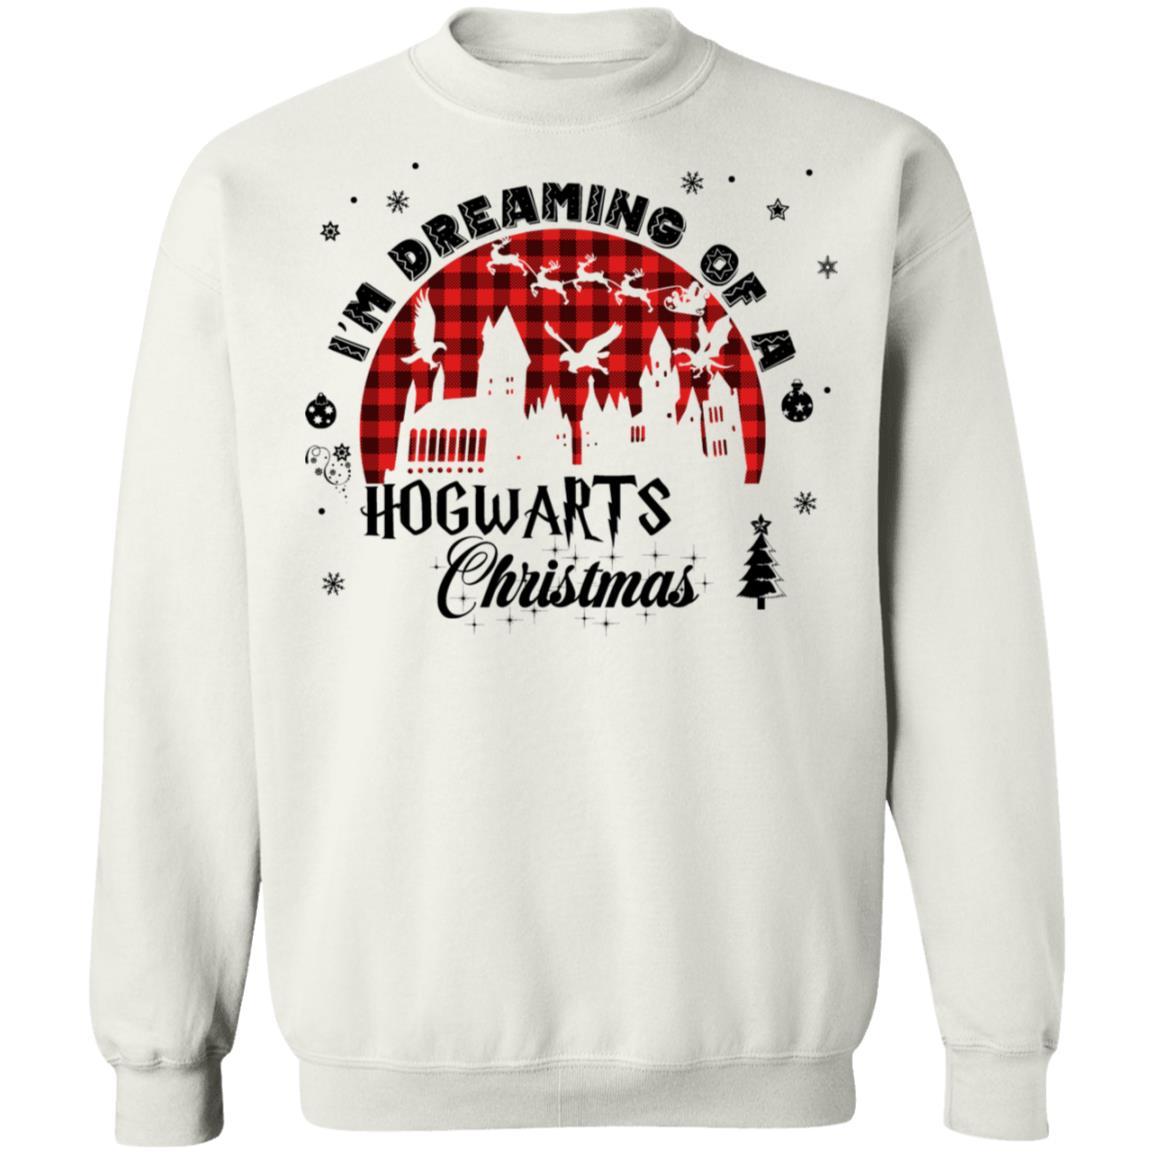 Harry Potter Christmas I'm Dreaming Of A Hogwarts Christmas Sweatshirt